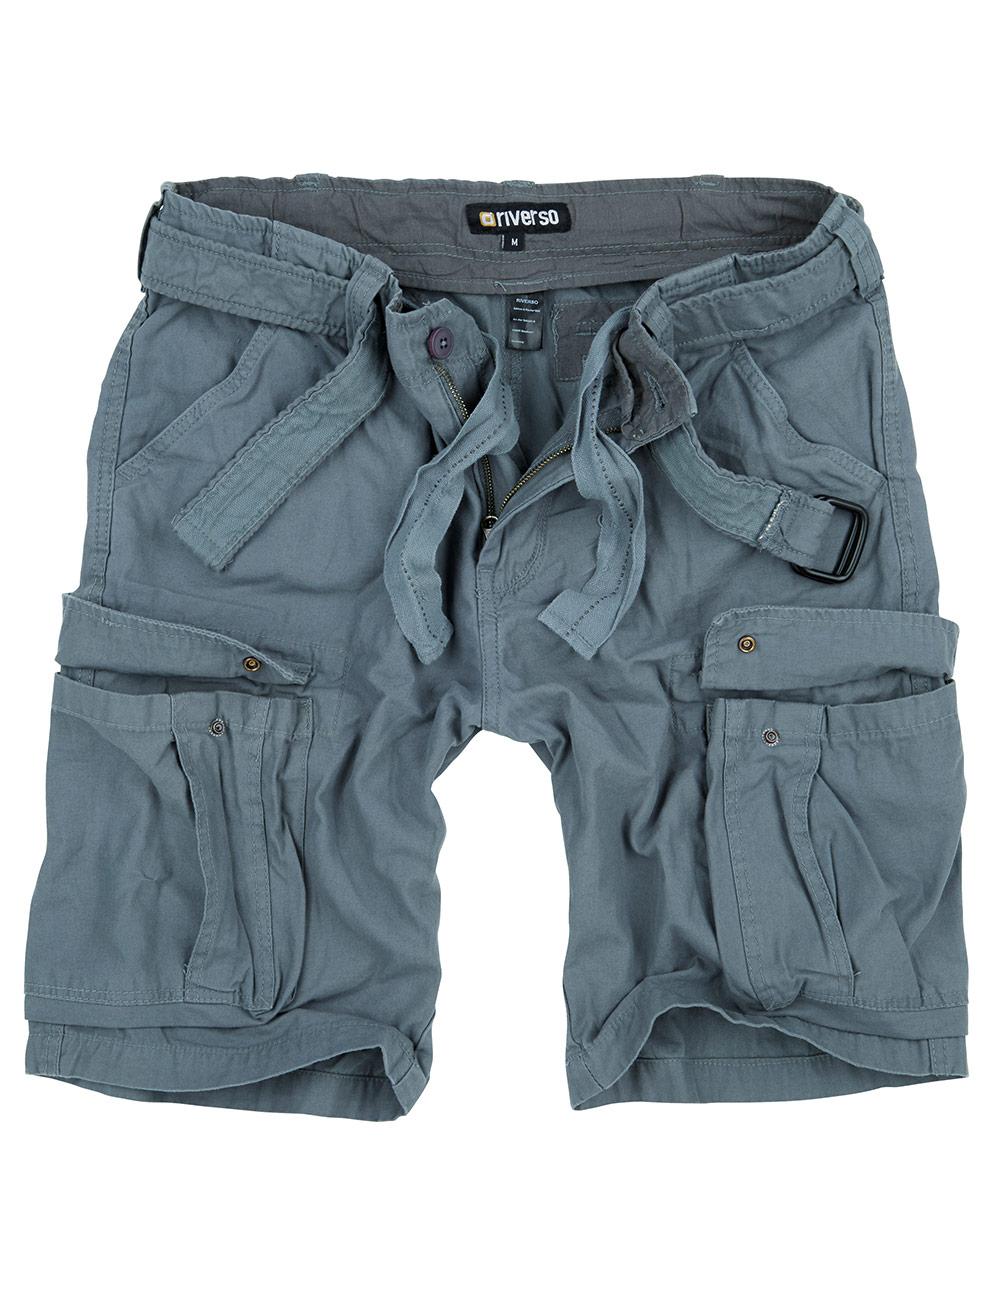 7XL riverso Herren Cargo Shorts RIVFynn Kurze Hose Gürtel 100/% Baumwolle Uni S